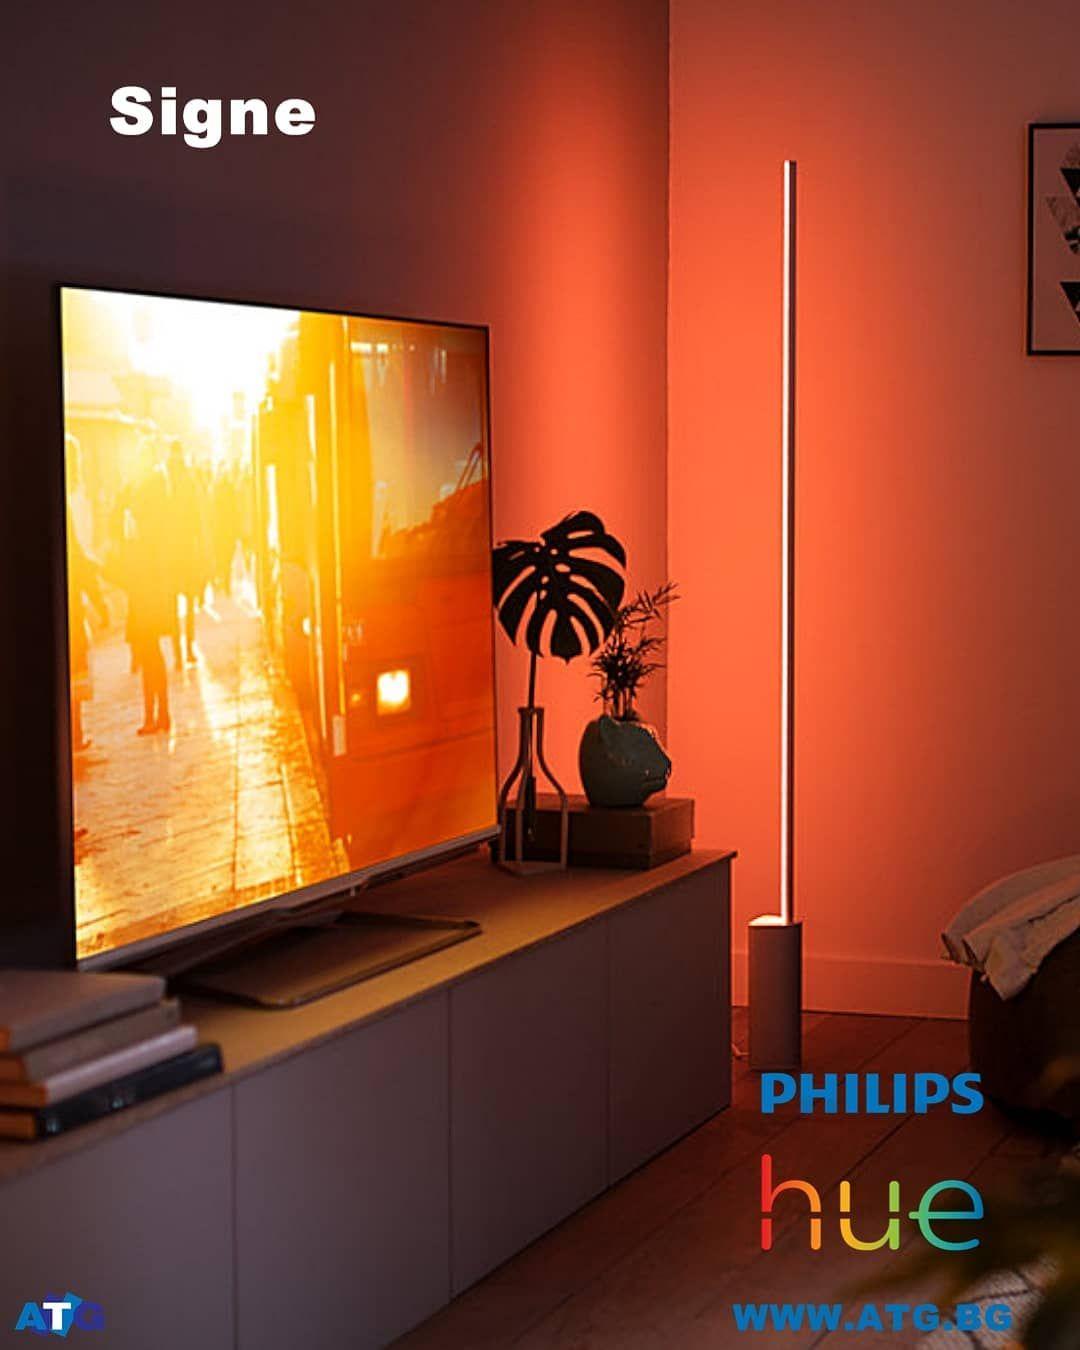 Home Decor Home Decor Decor Hue Philips Led Floor Lamp Philips Hue Lights